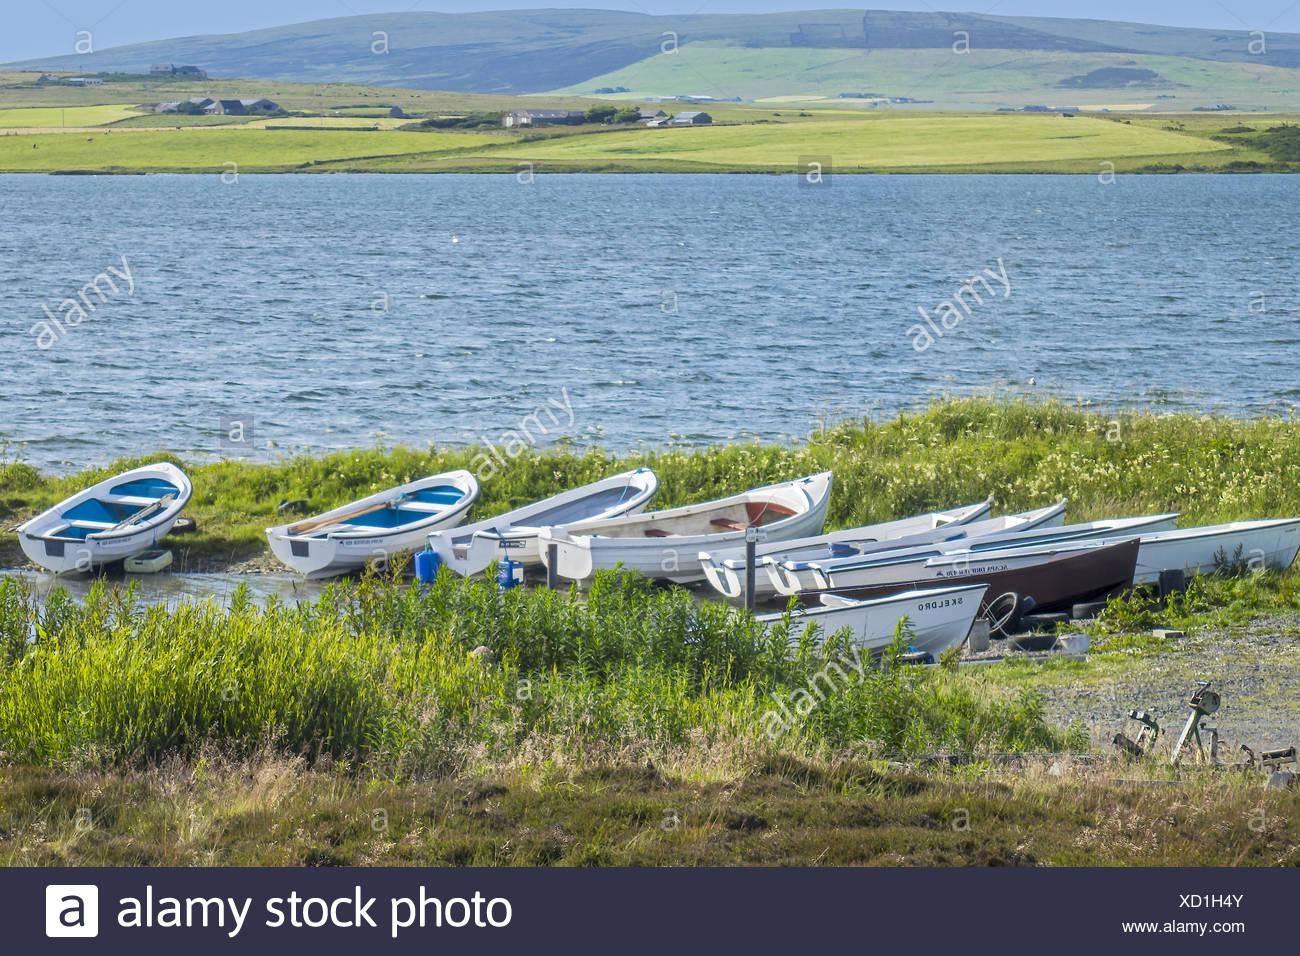 Loch of Harray Mainland Orkney Islands UK Stock Photo